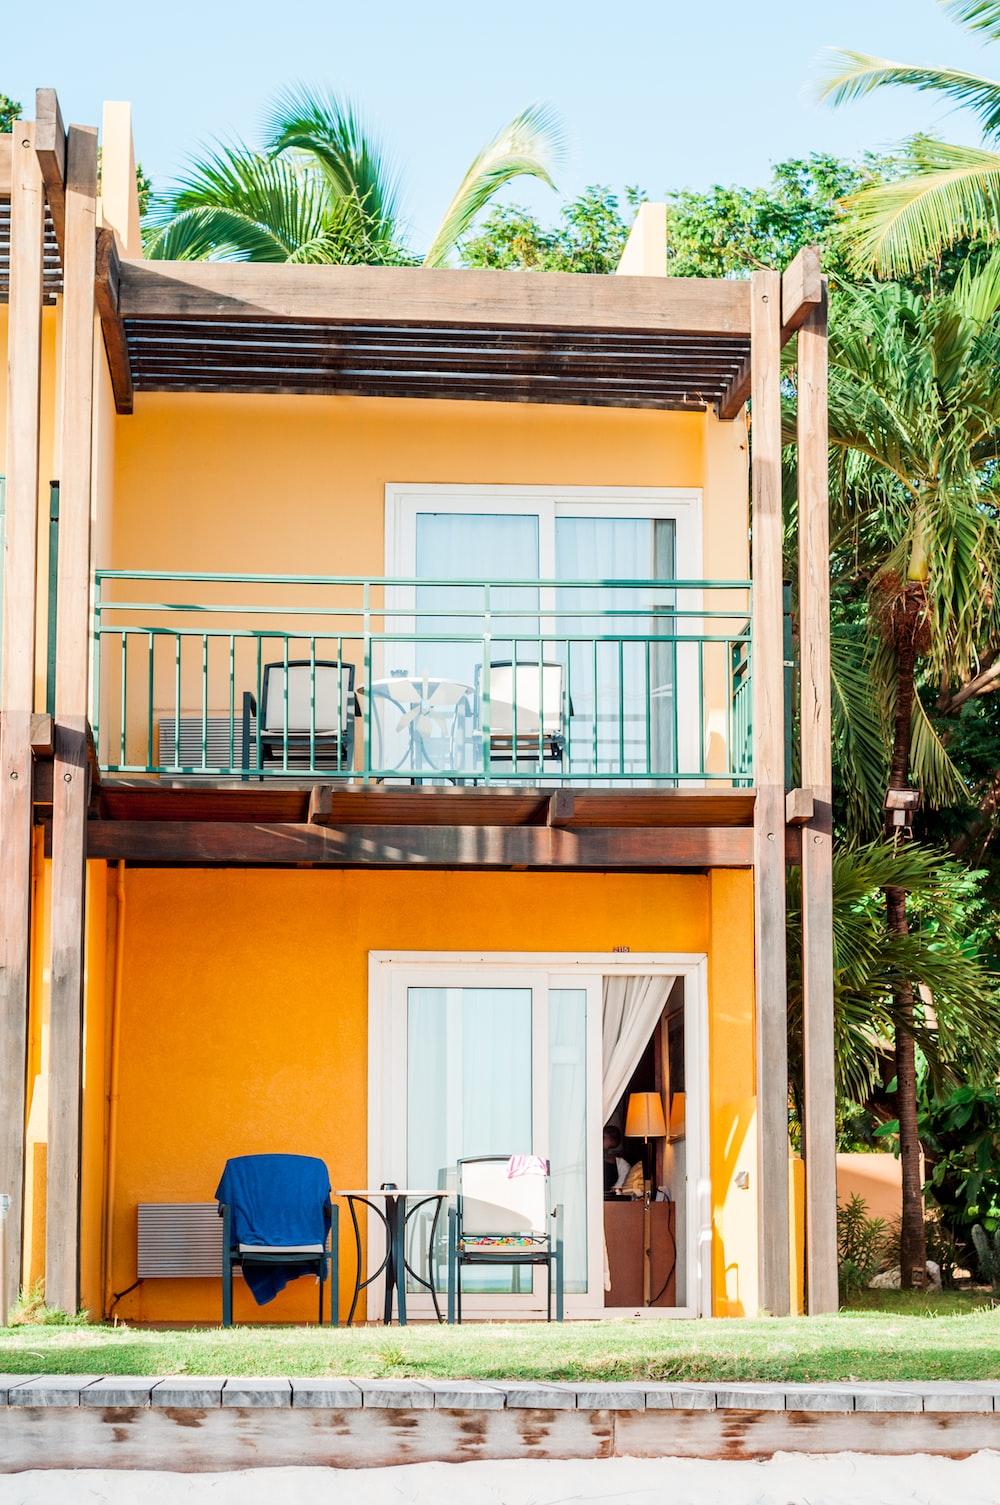 orange and white 2-storey building beside palm tree